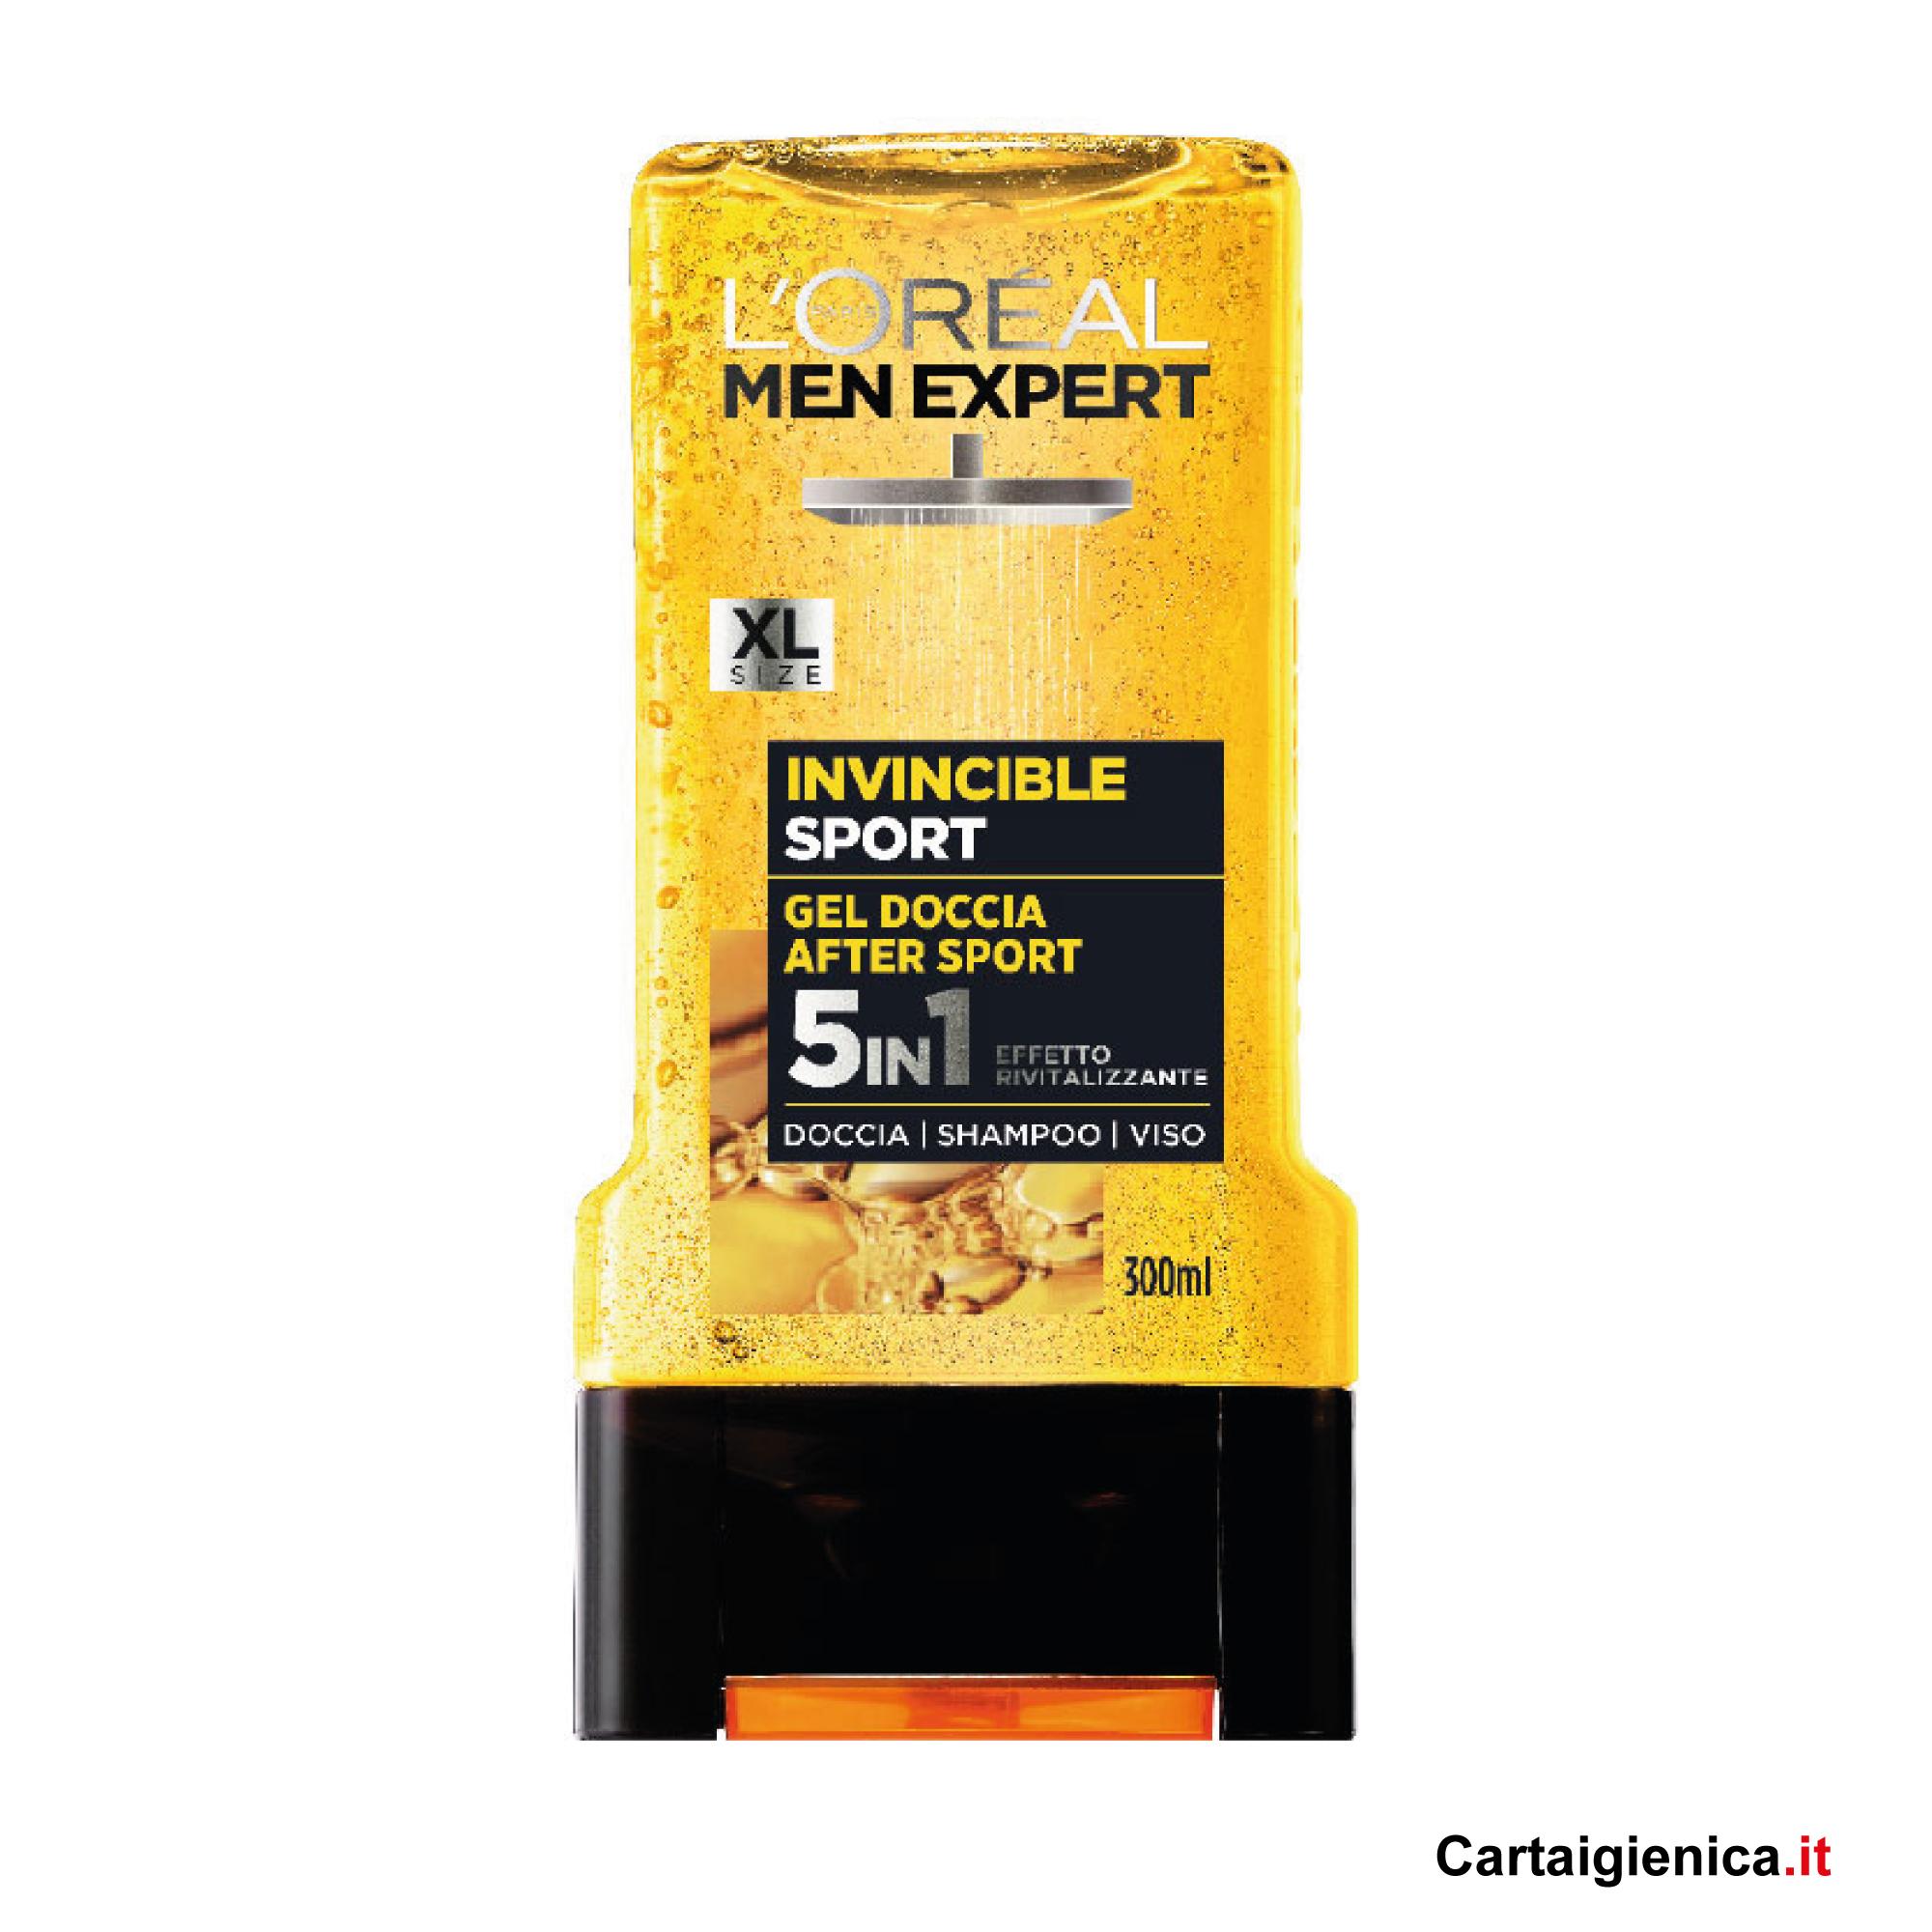 loreal men expert invincible sport gel doccia after sport shampoo viso 300 ml